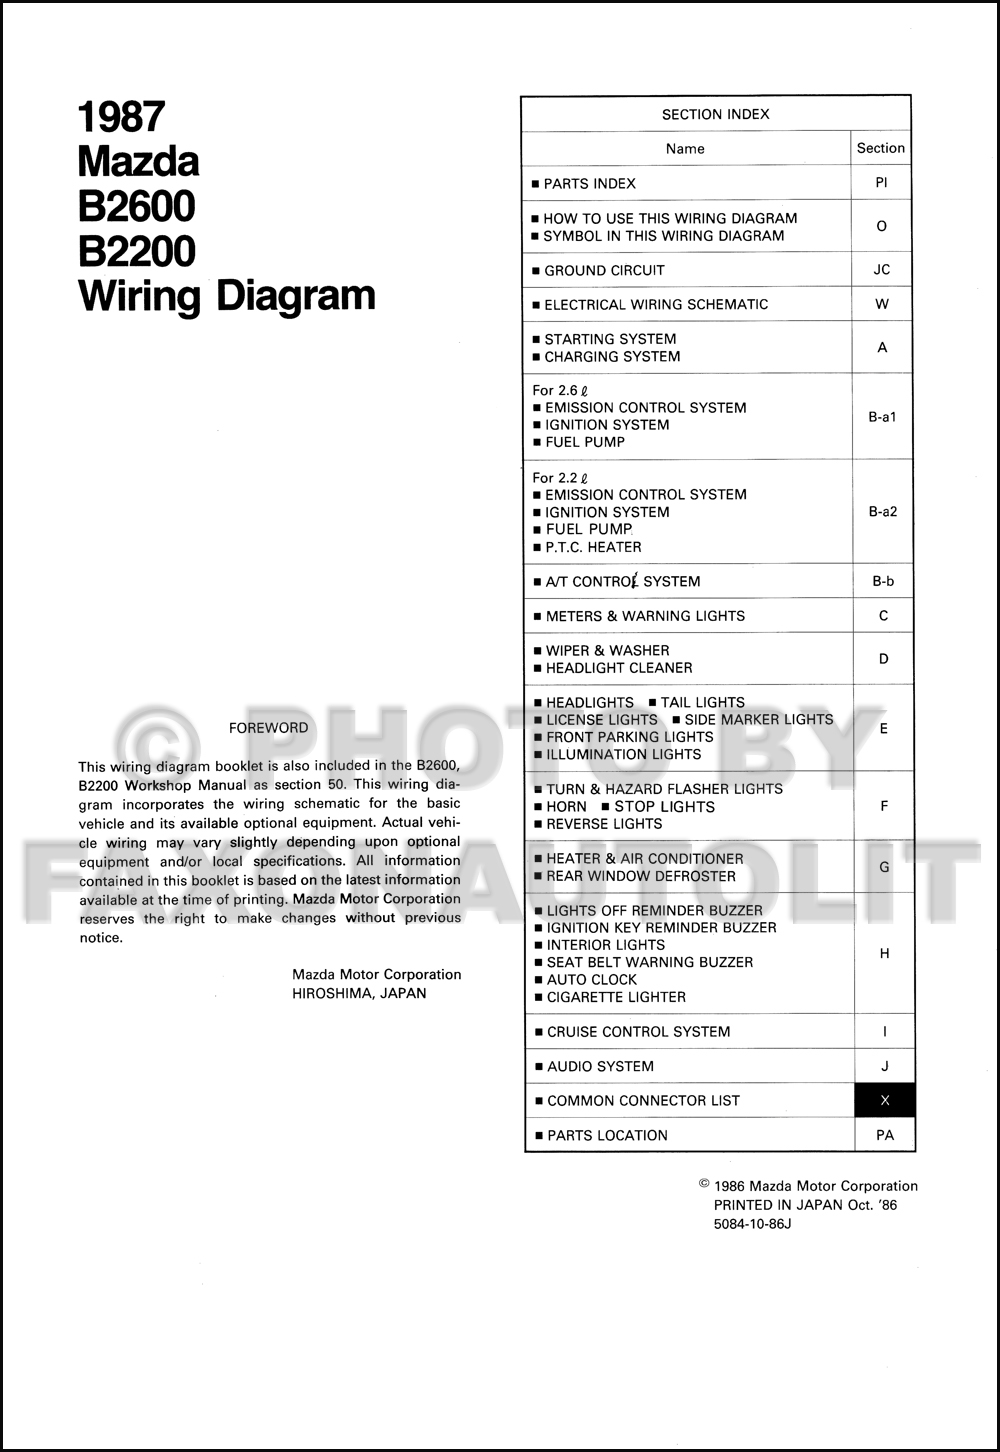 1987MazdaB2600B2200OWD TOC 1987 mazda b2200 b2600 pickup truck wiring diagram manual original 1987 mazda b2000 spark plug wiring diagram at soozxer.org